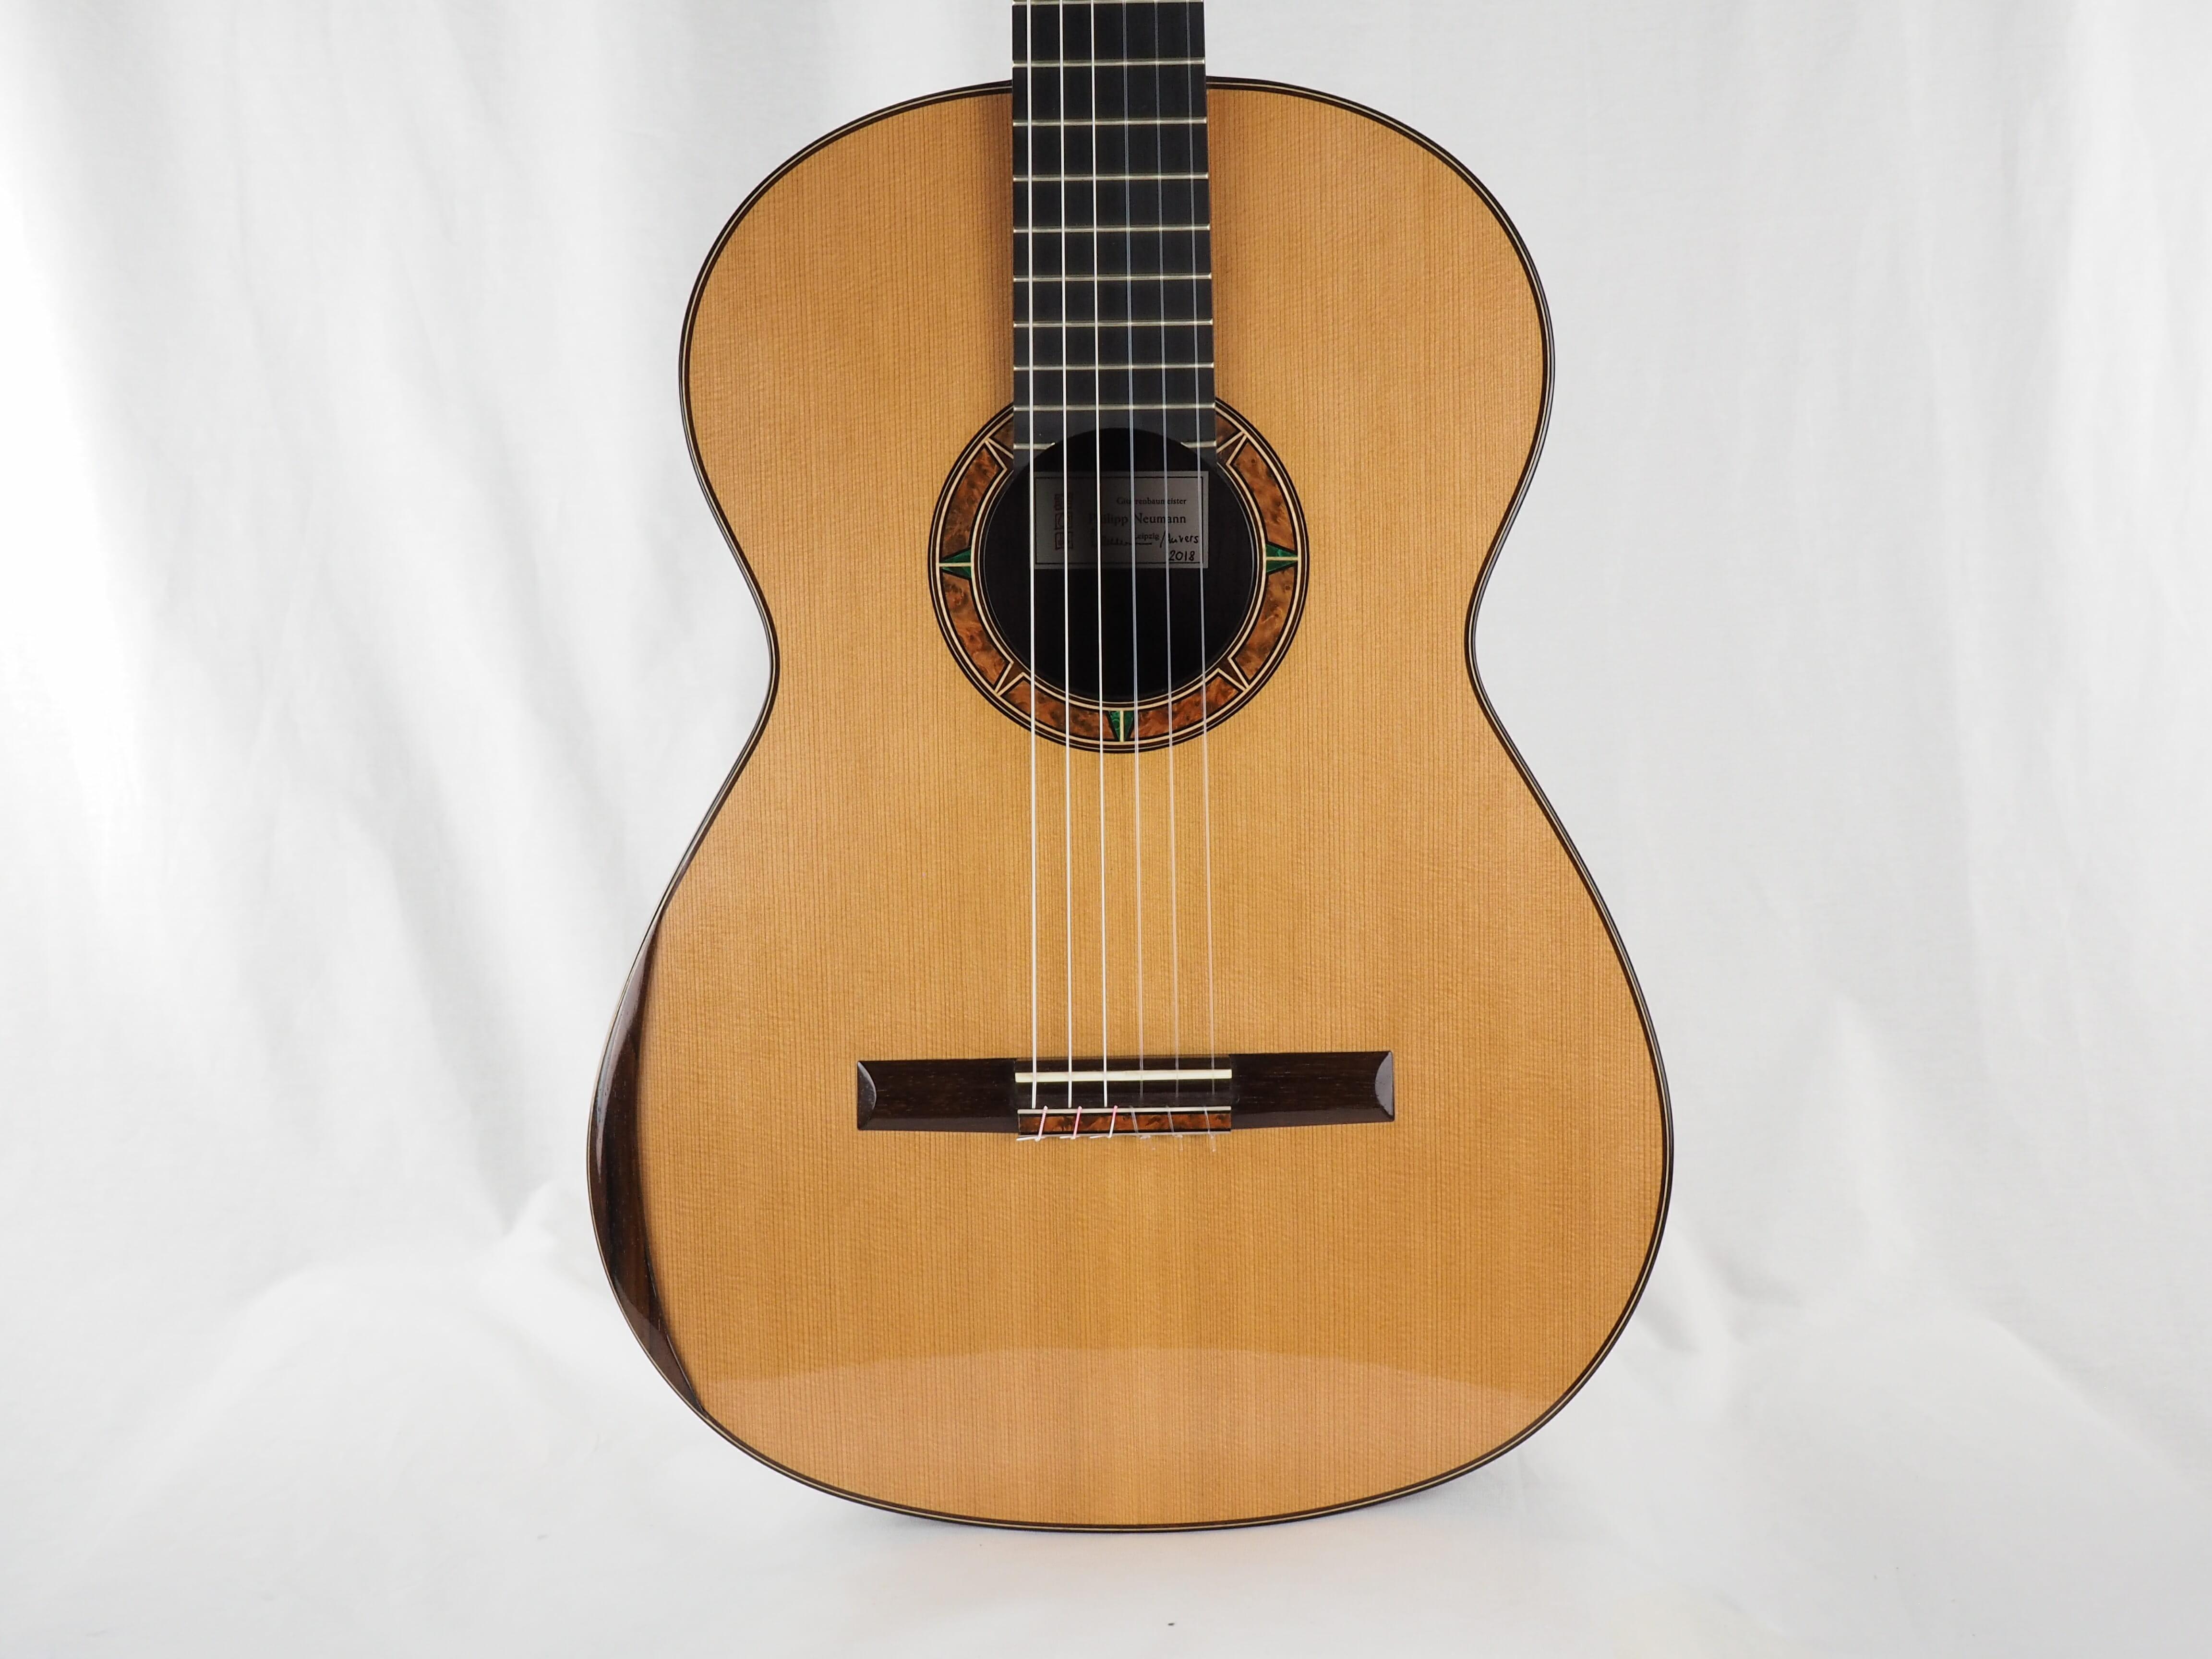 luthier philipp neumann 2018 germany classical concert guitar. Black Bedroom Furniture Sets. Home Design Ideas